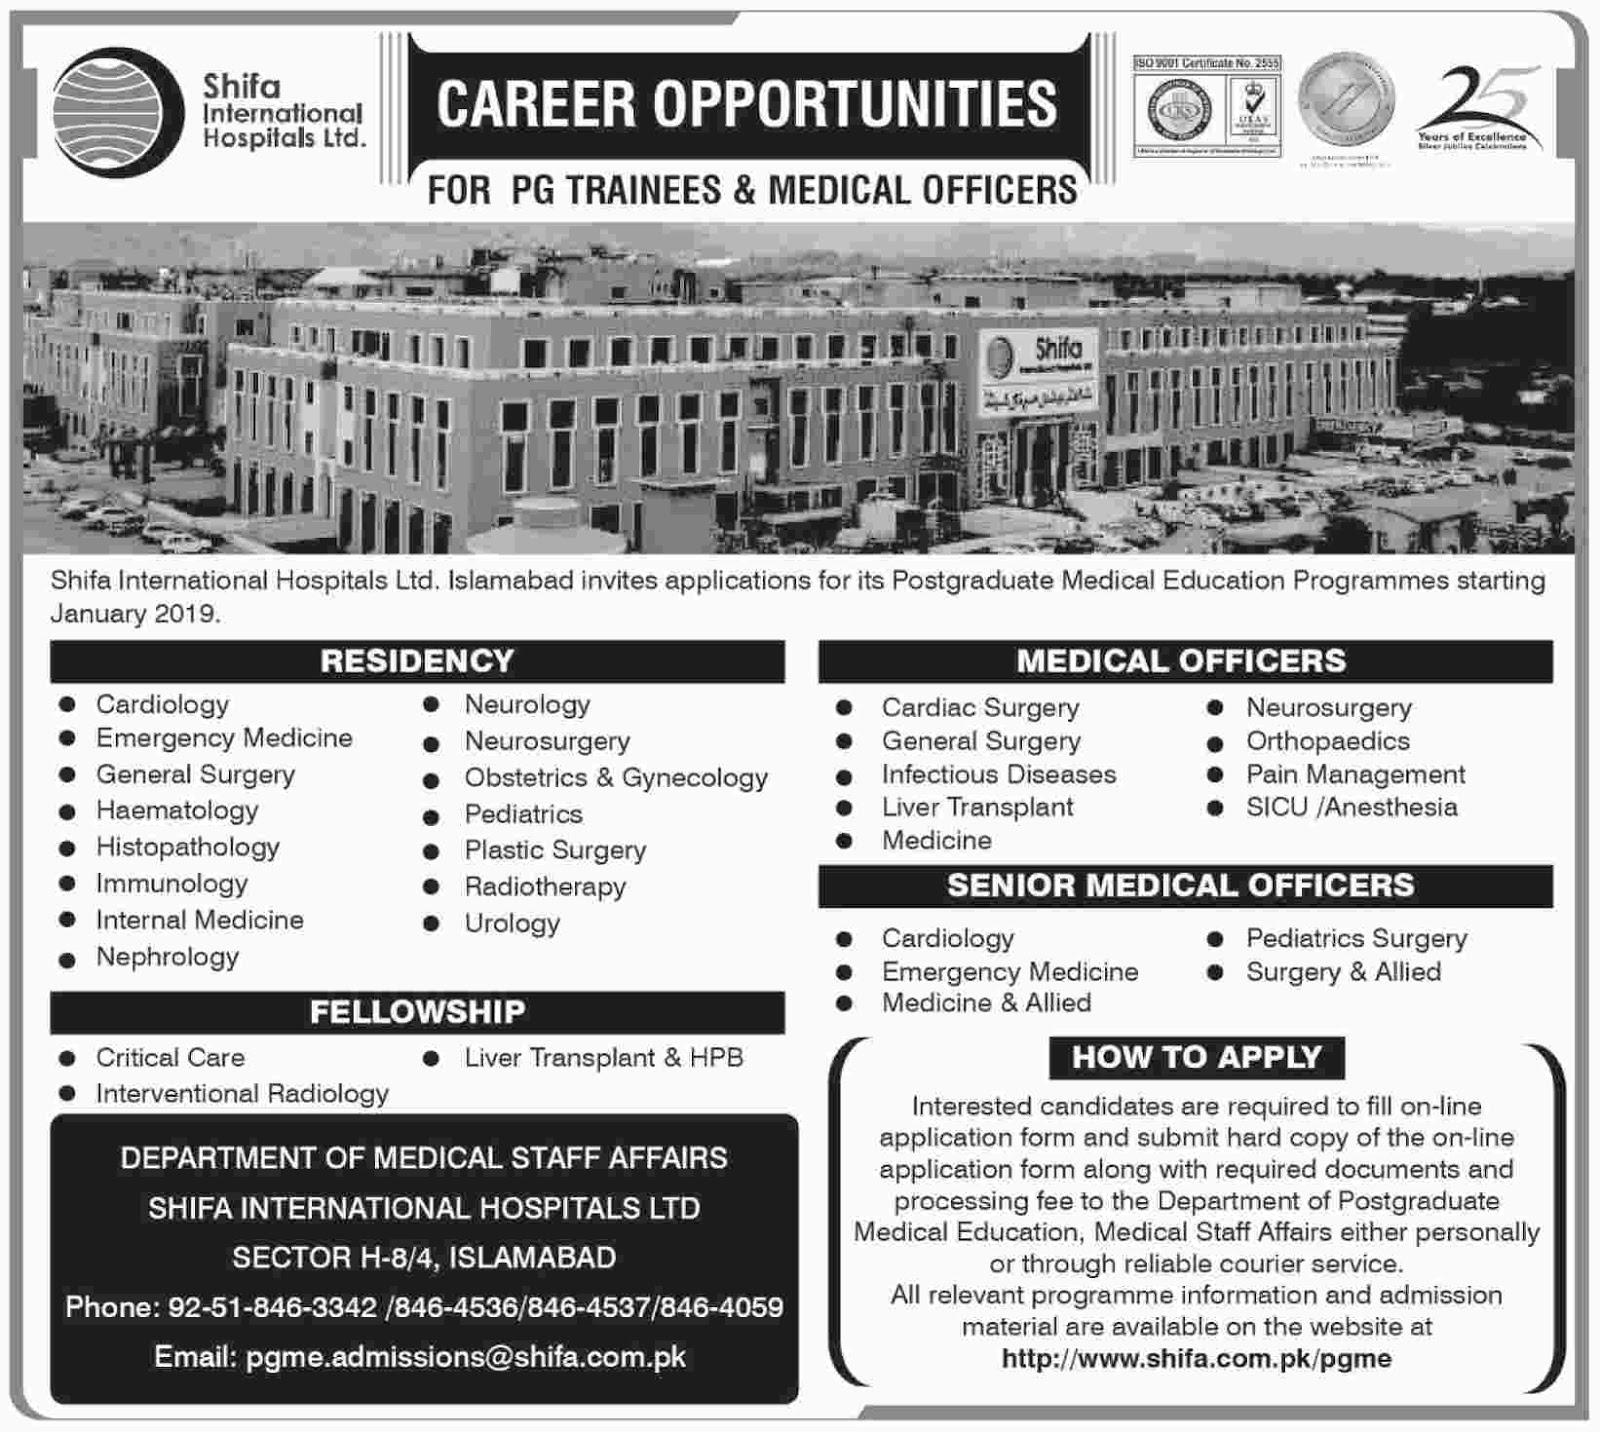 Latest Vacancies Announced in Shifa International Hospital Islamabad - Online Application Form - 10 October 2018 - Naya Pakistan